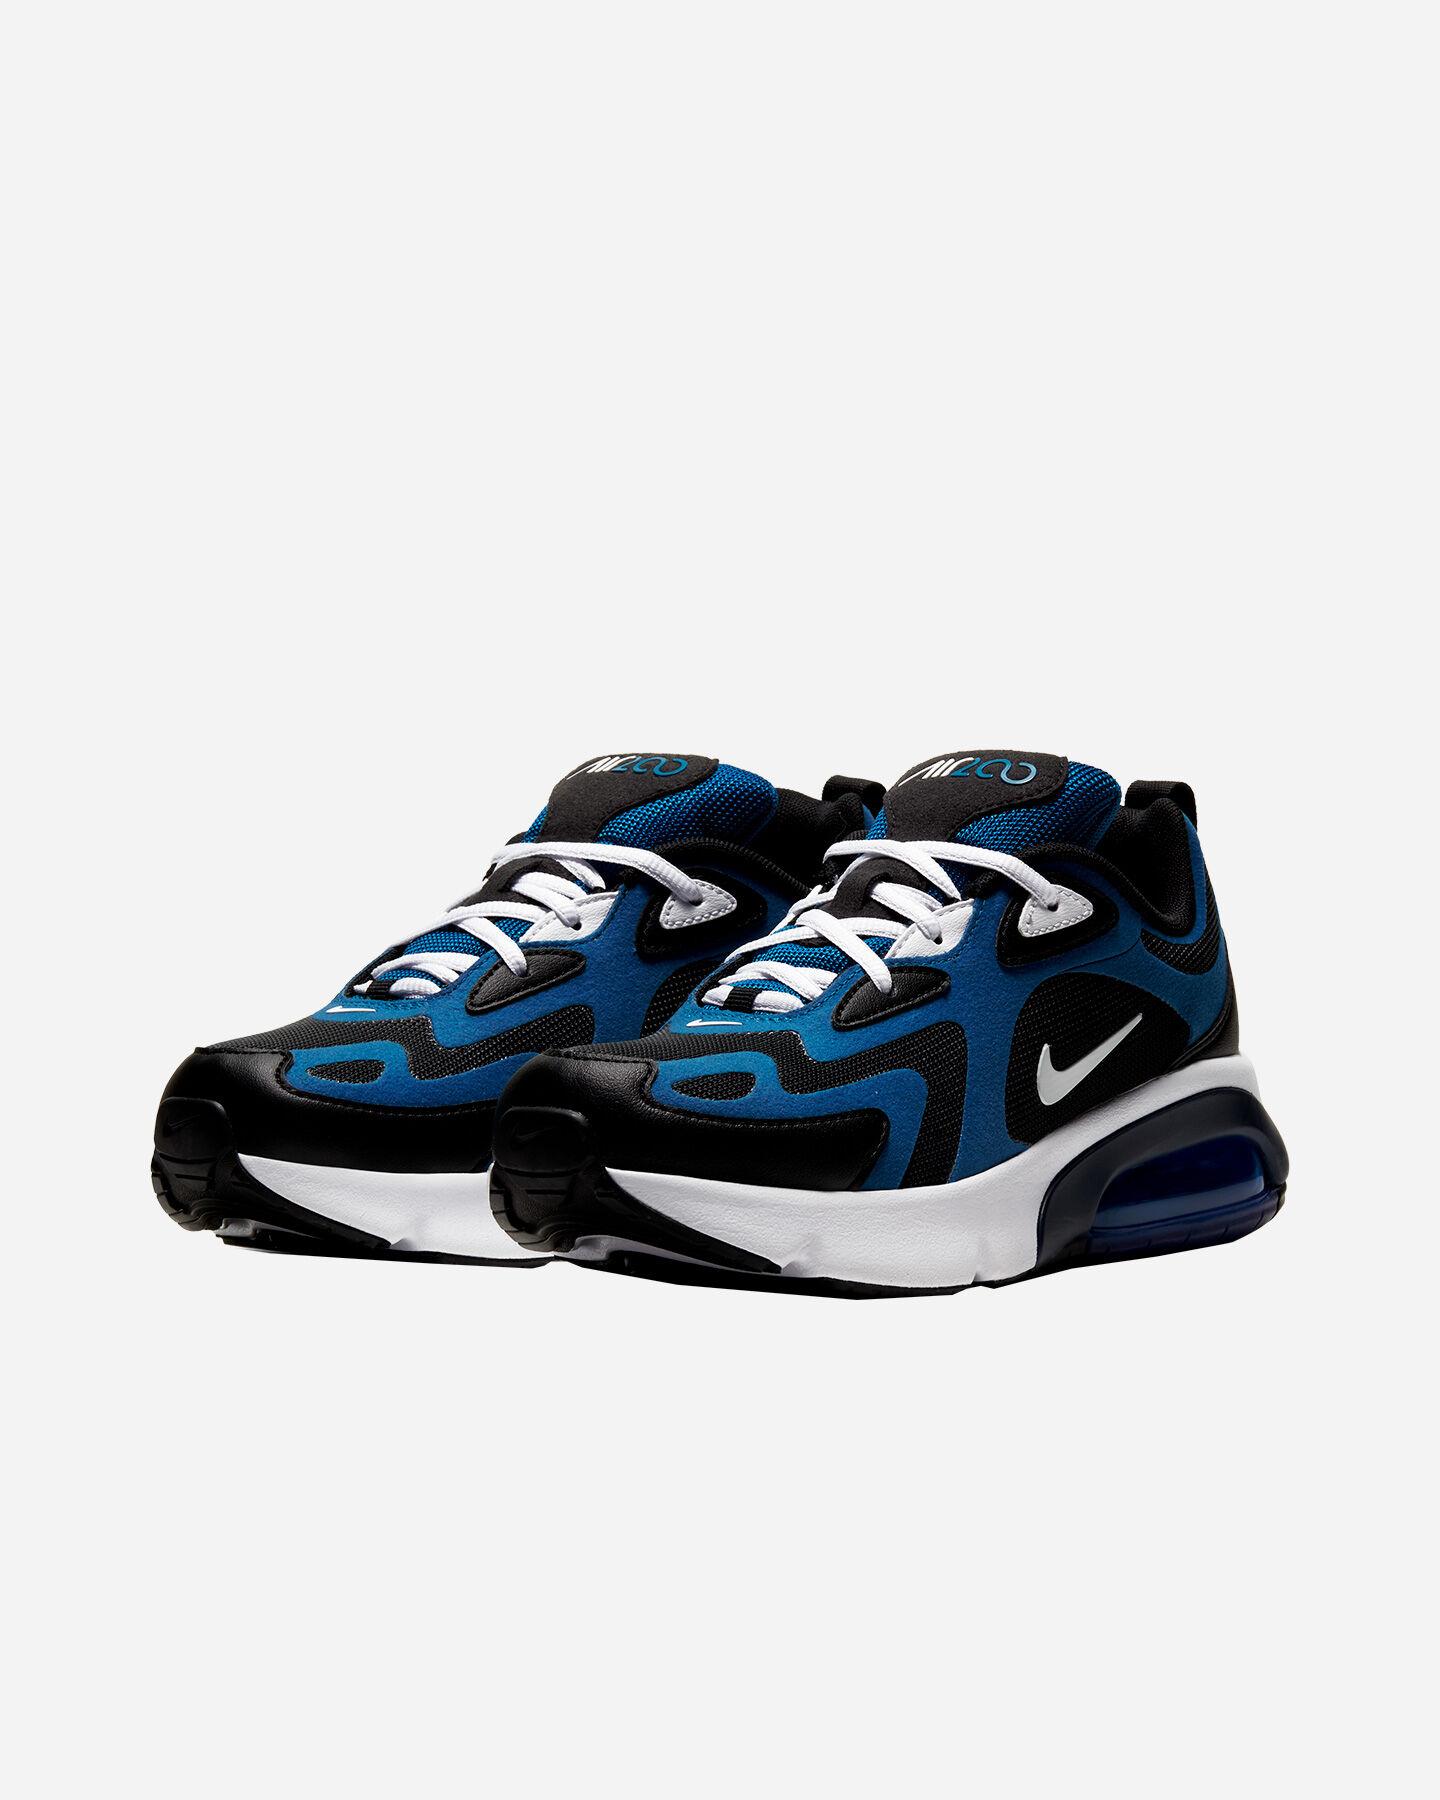 Scarpe sneakers NIKE AIR MAX 200 GS JR S5161546 scatto 1